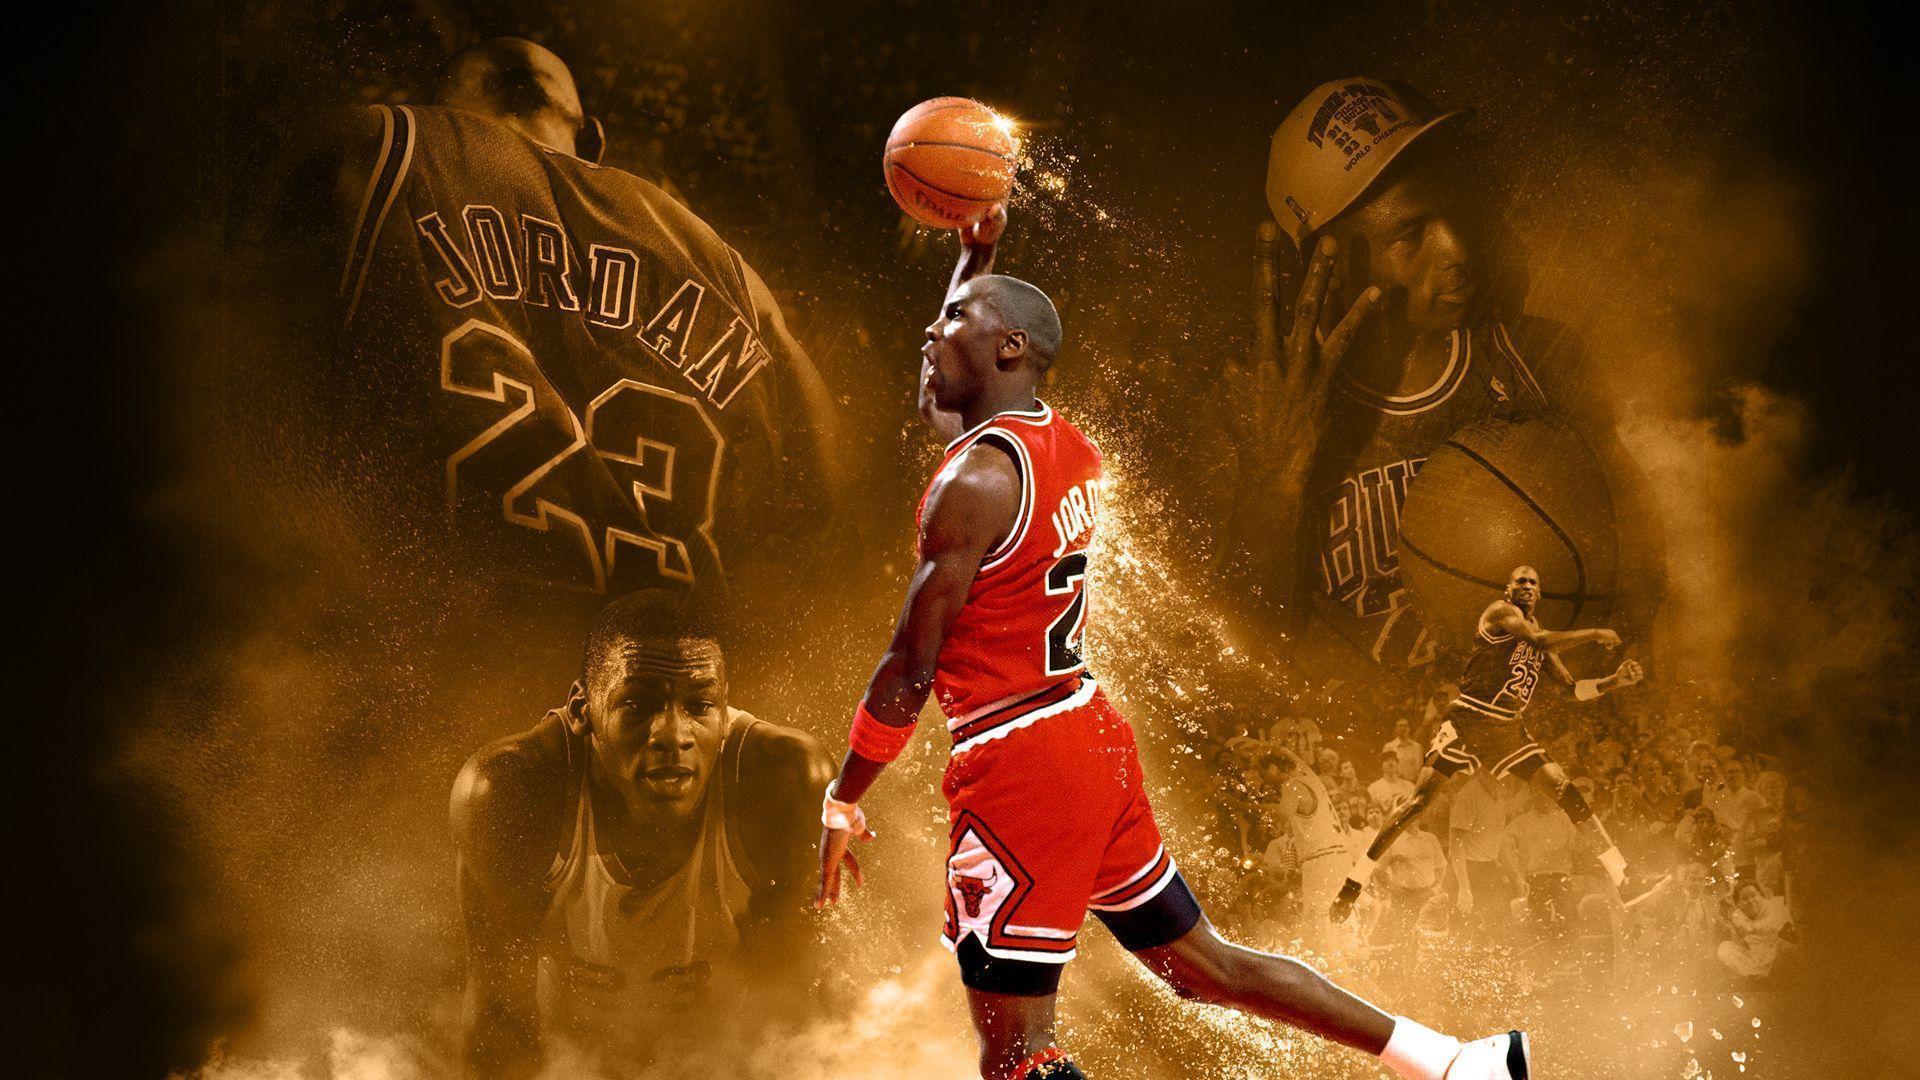 97 Nba Basketball Wallpaper 2016 On Wallpapersafari